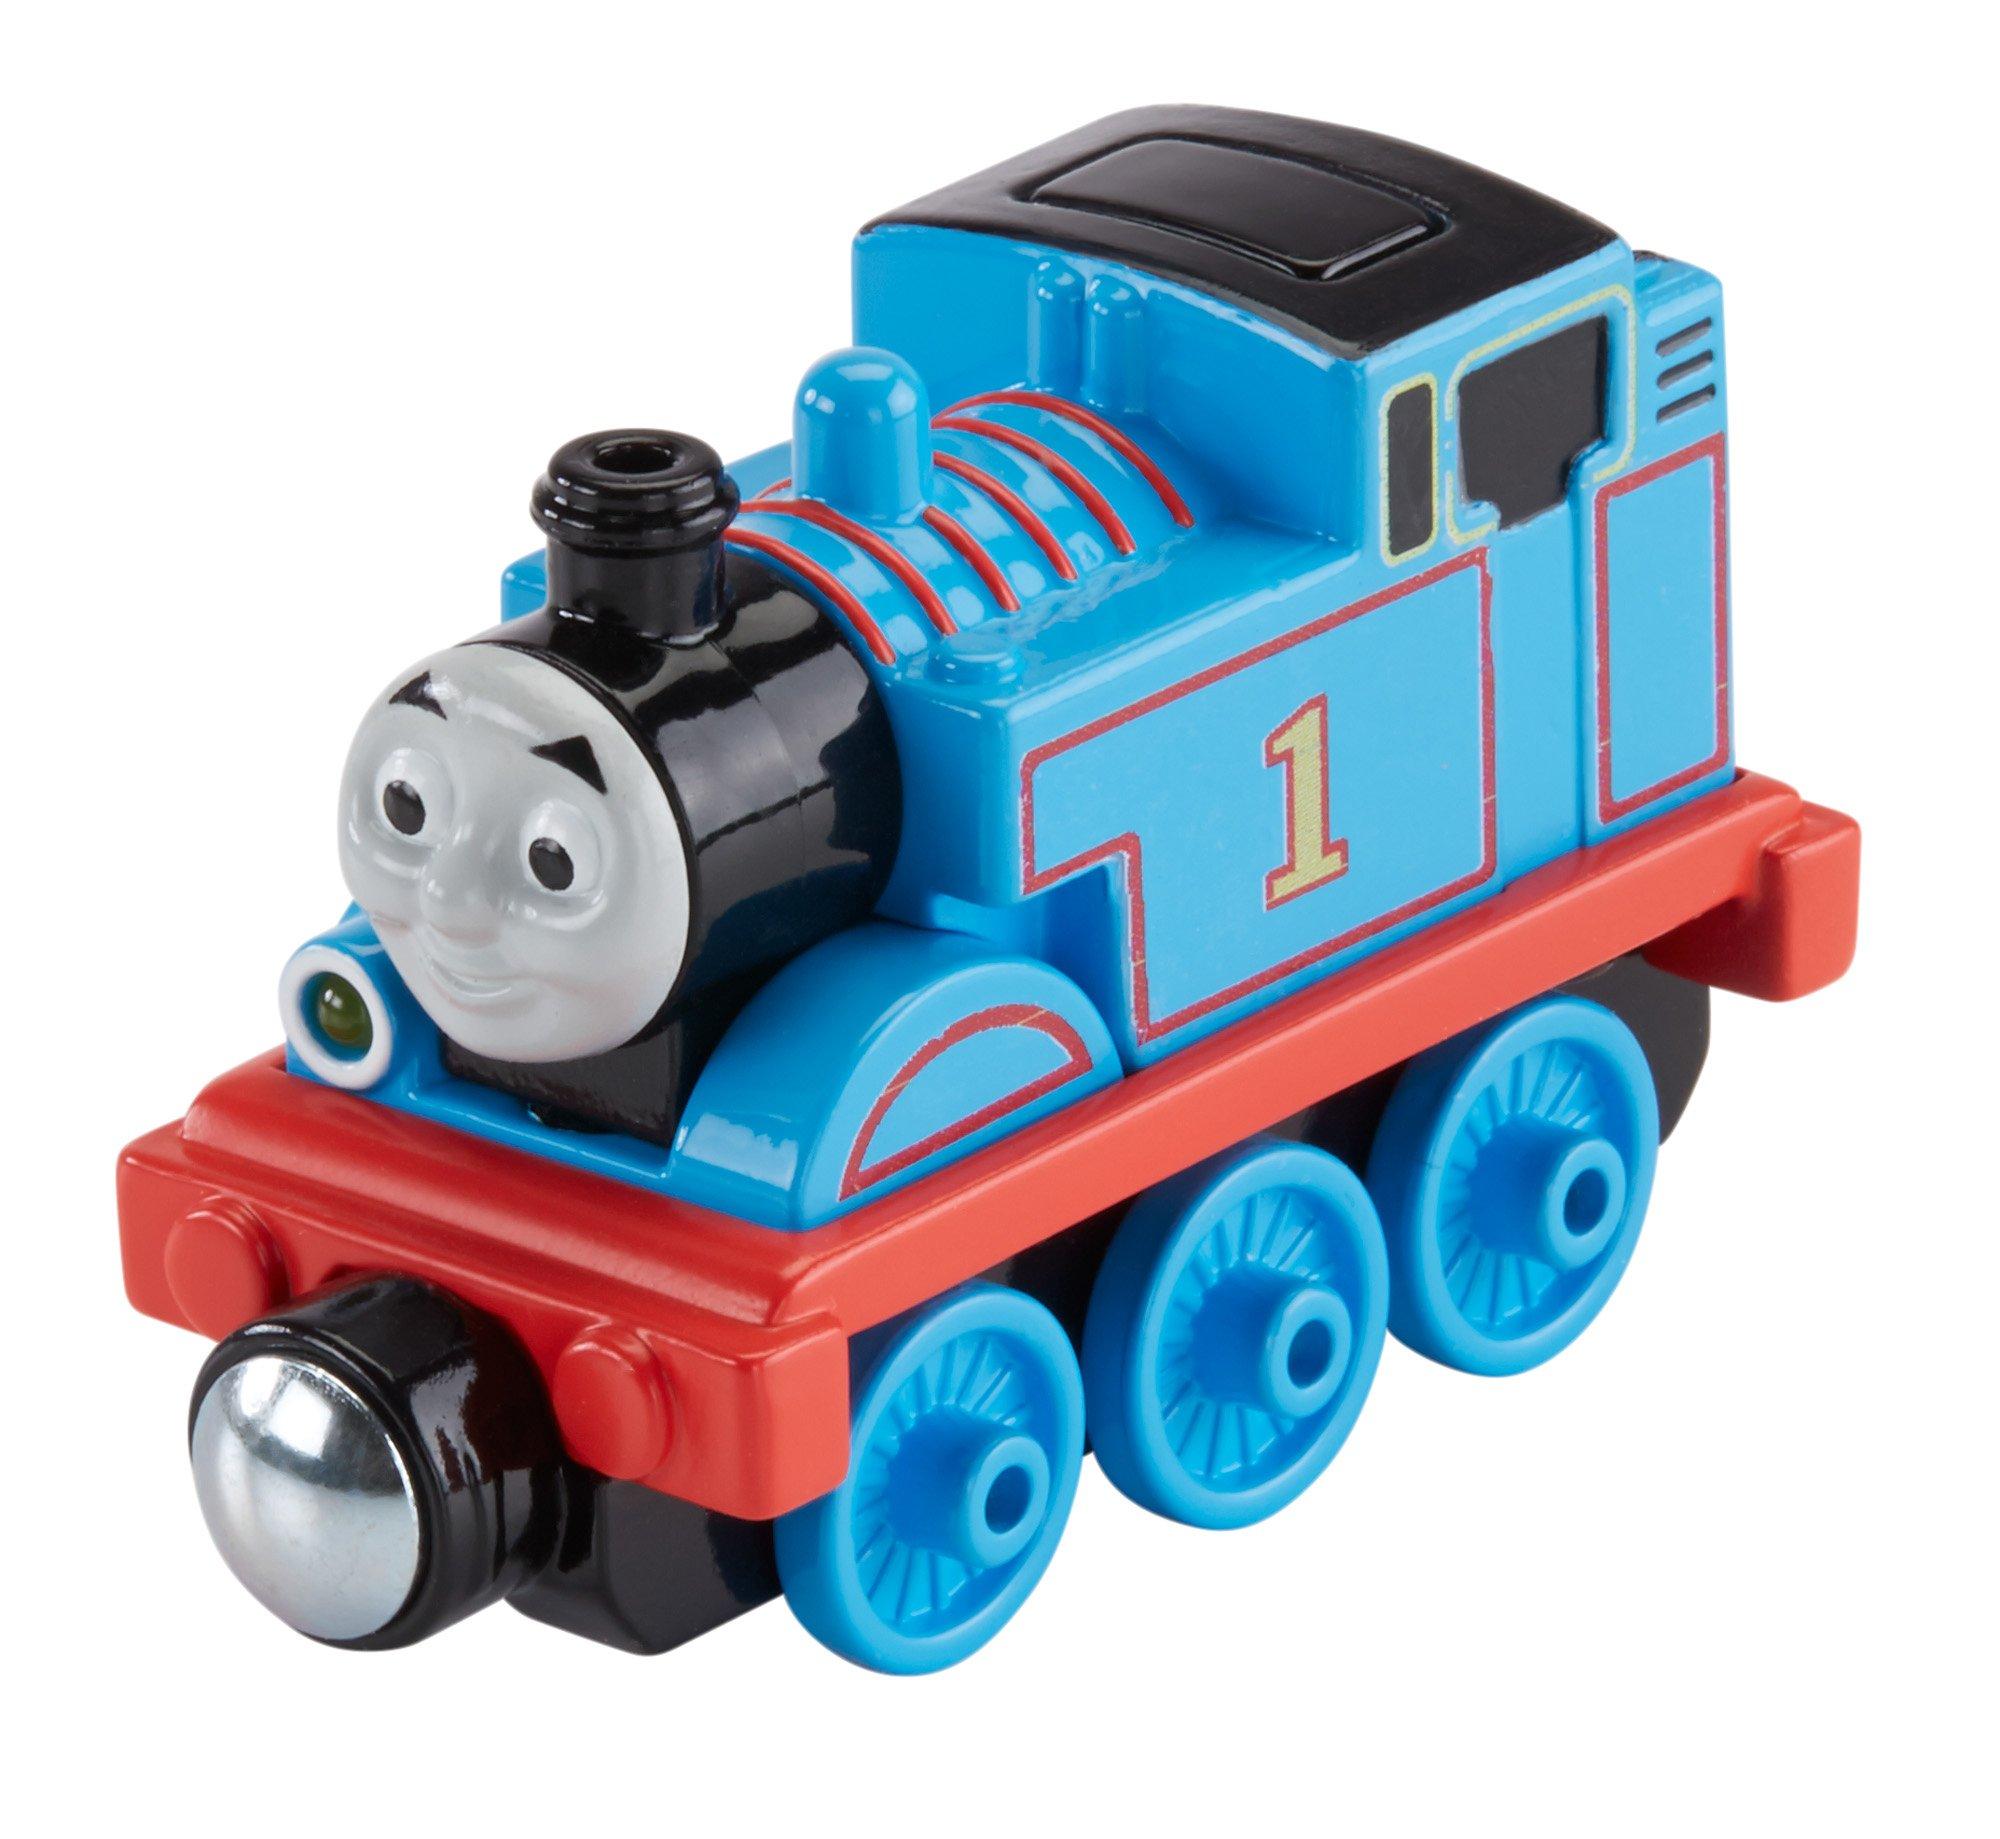 Thomas & Friends Fisher-Price Take-n-Play, Talking Thomas Train